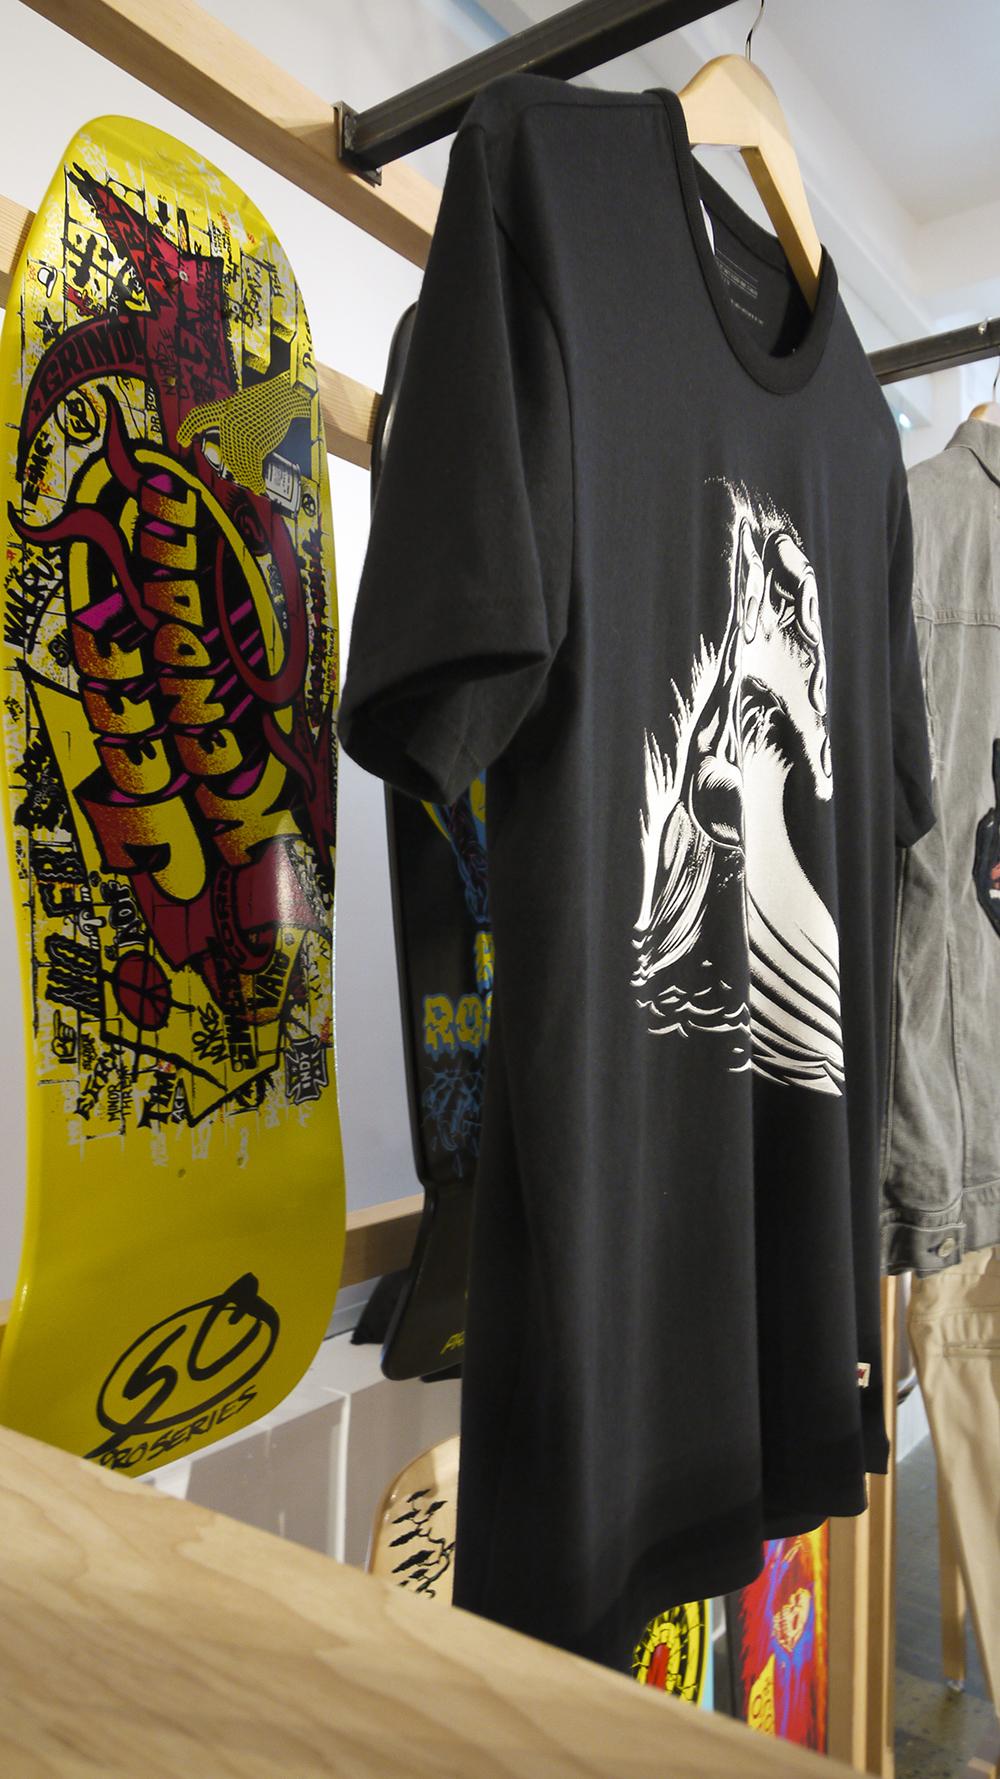 Jim Phillips Skate Deck T-Shirt Designs